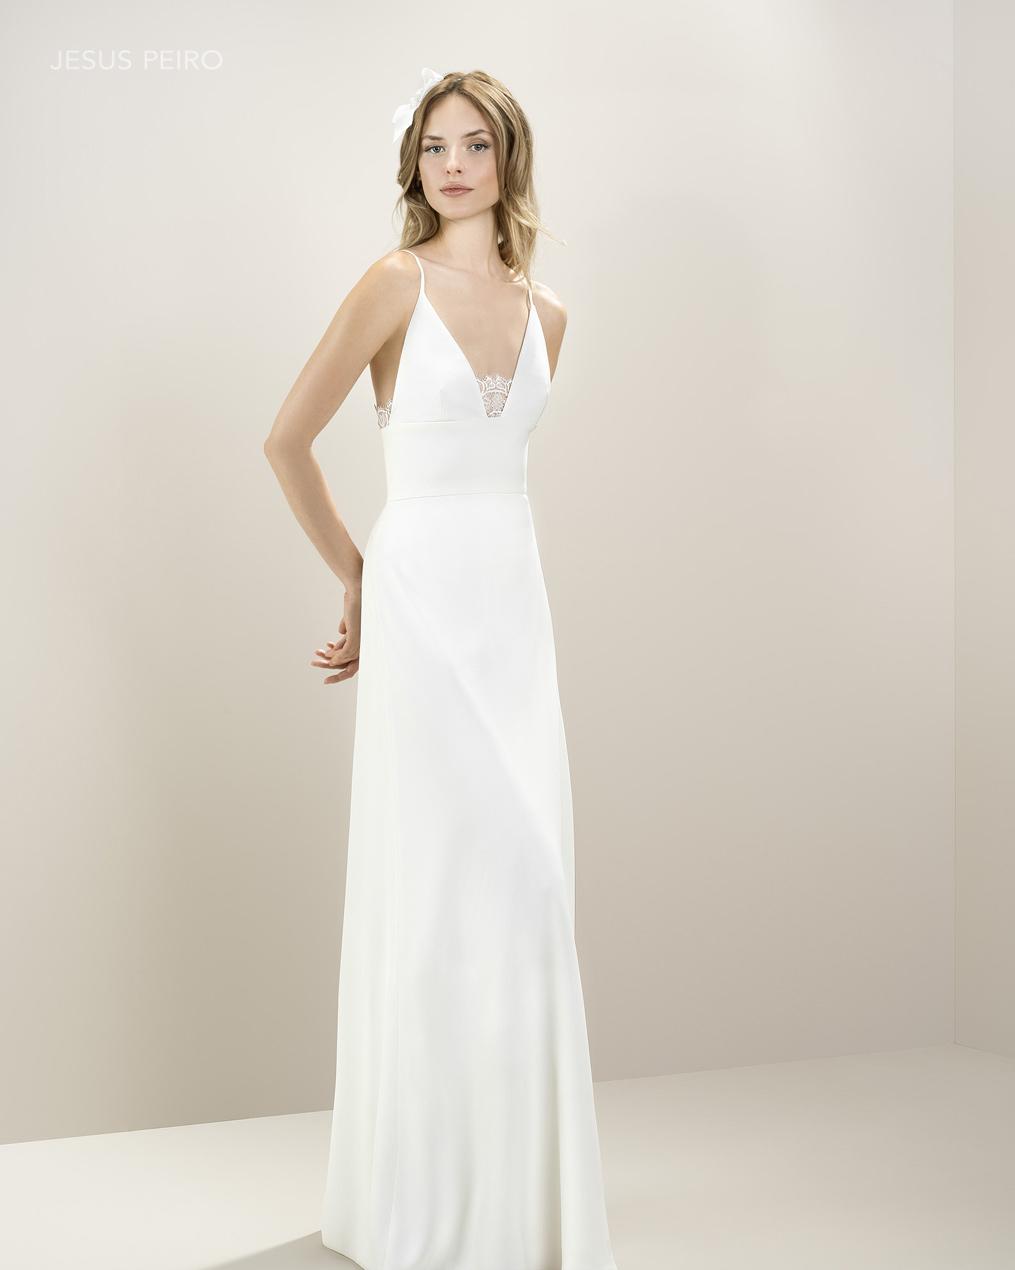 Vestido novia Jesús Peiró Ref.8026